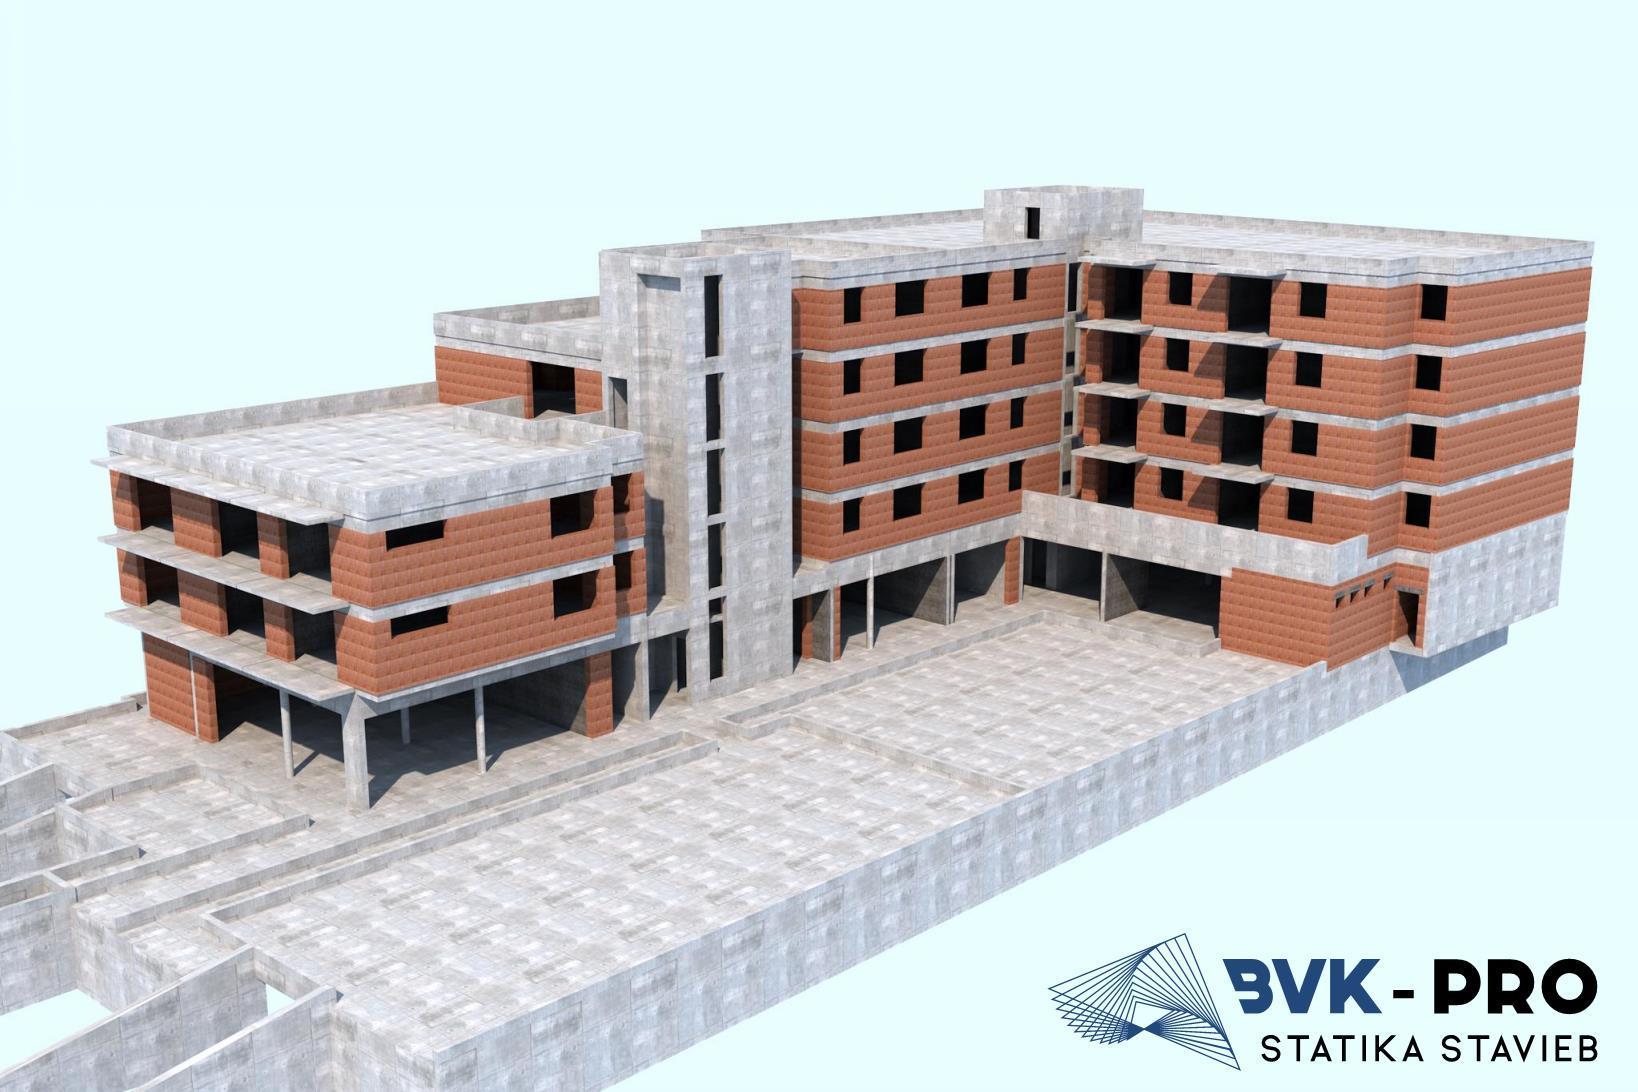 Gradus Residence Bvk Pro S R O  Page 009